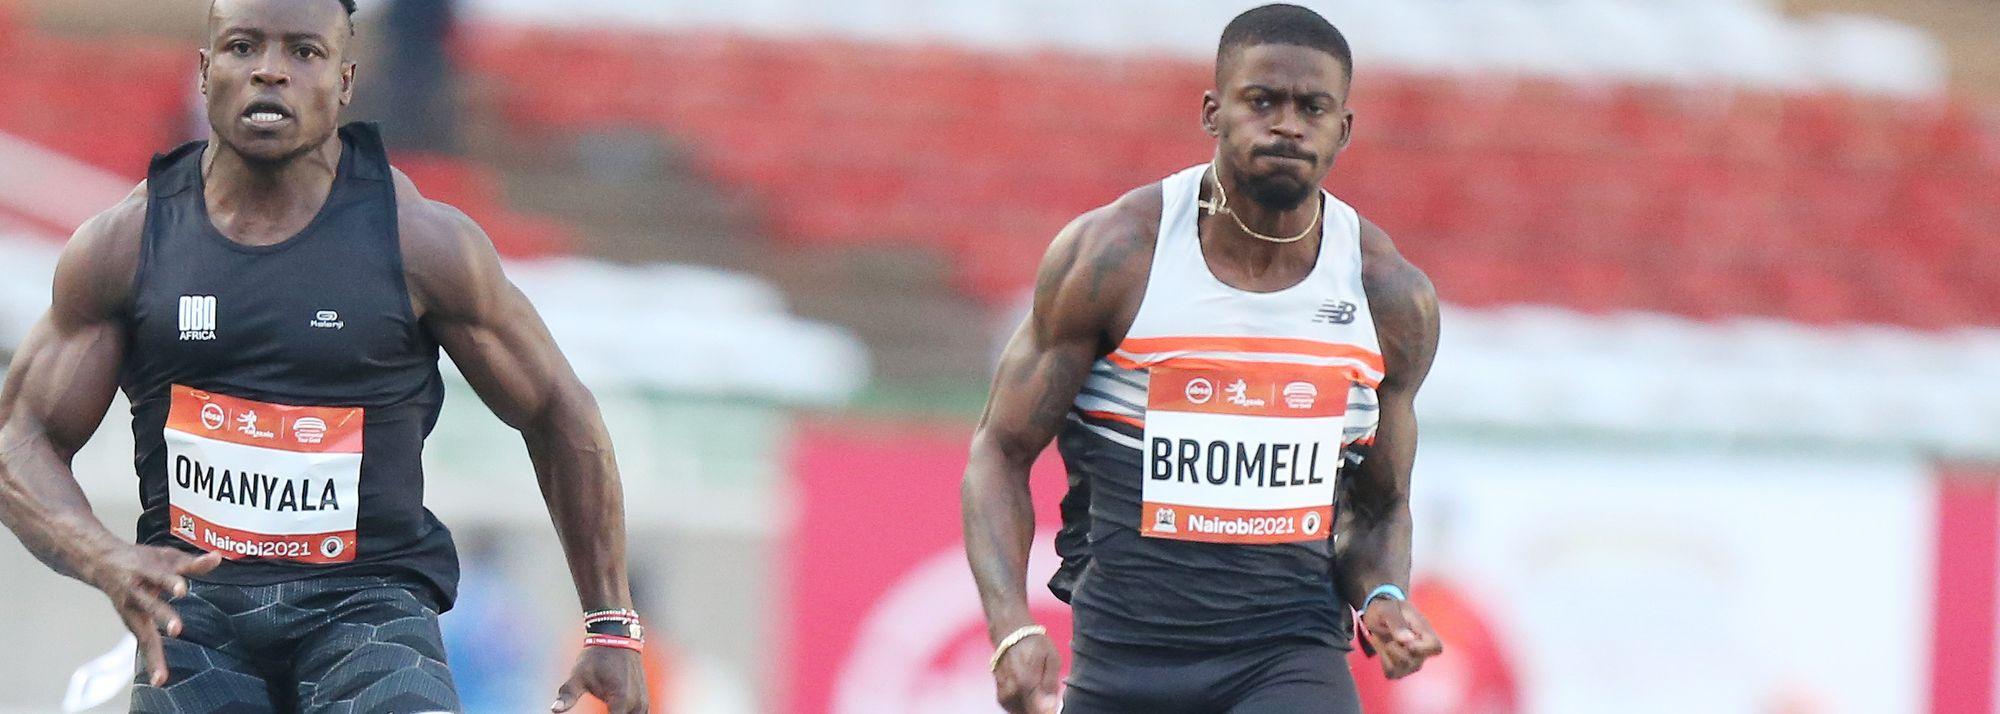 In second, Ferdinand Omanyala clocks African record of 9.77